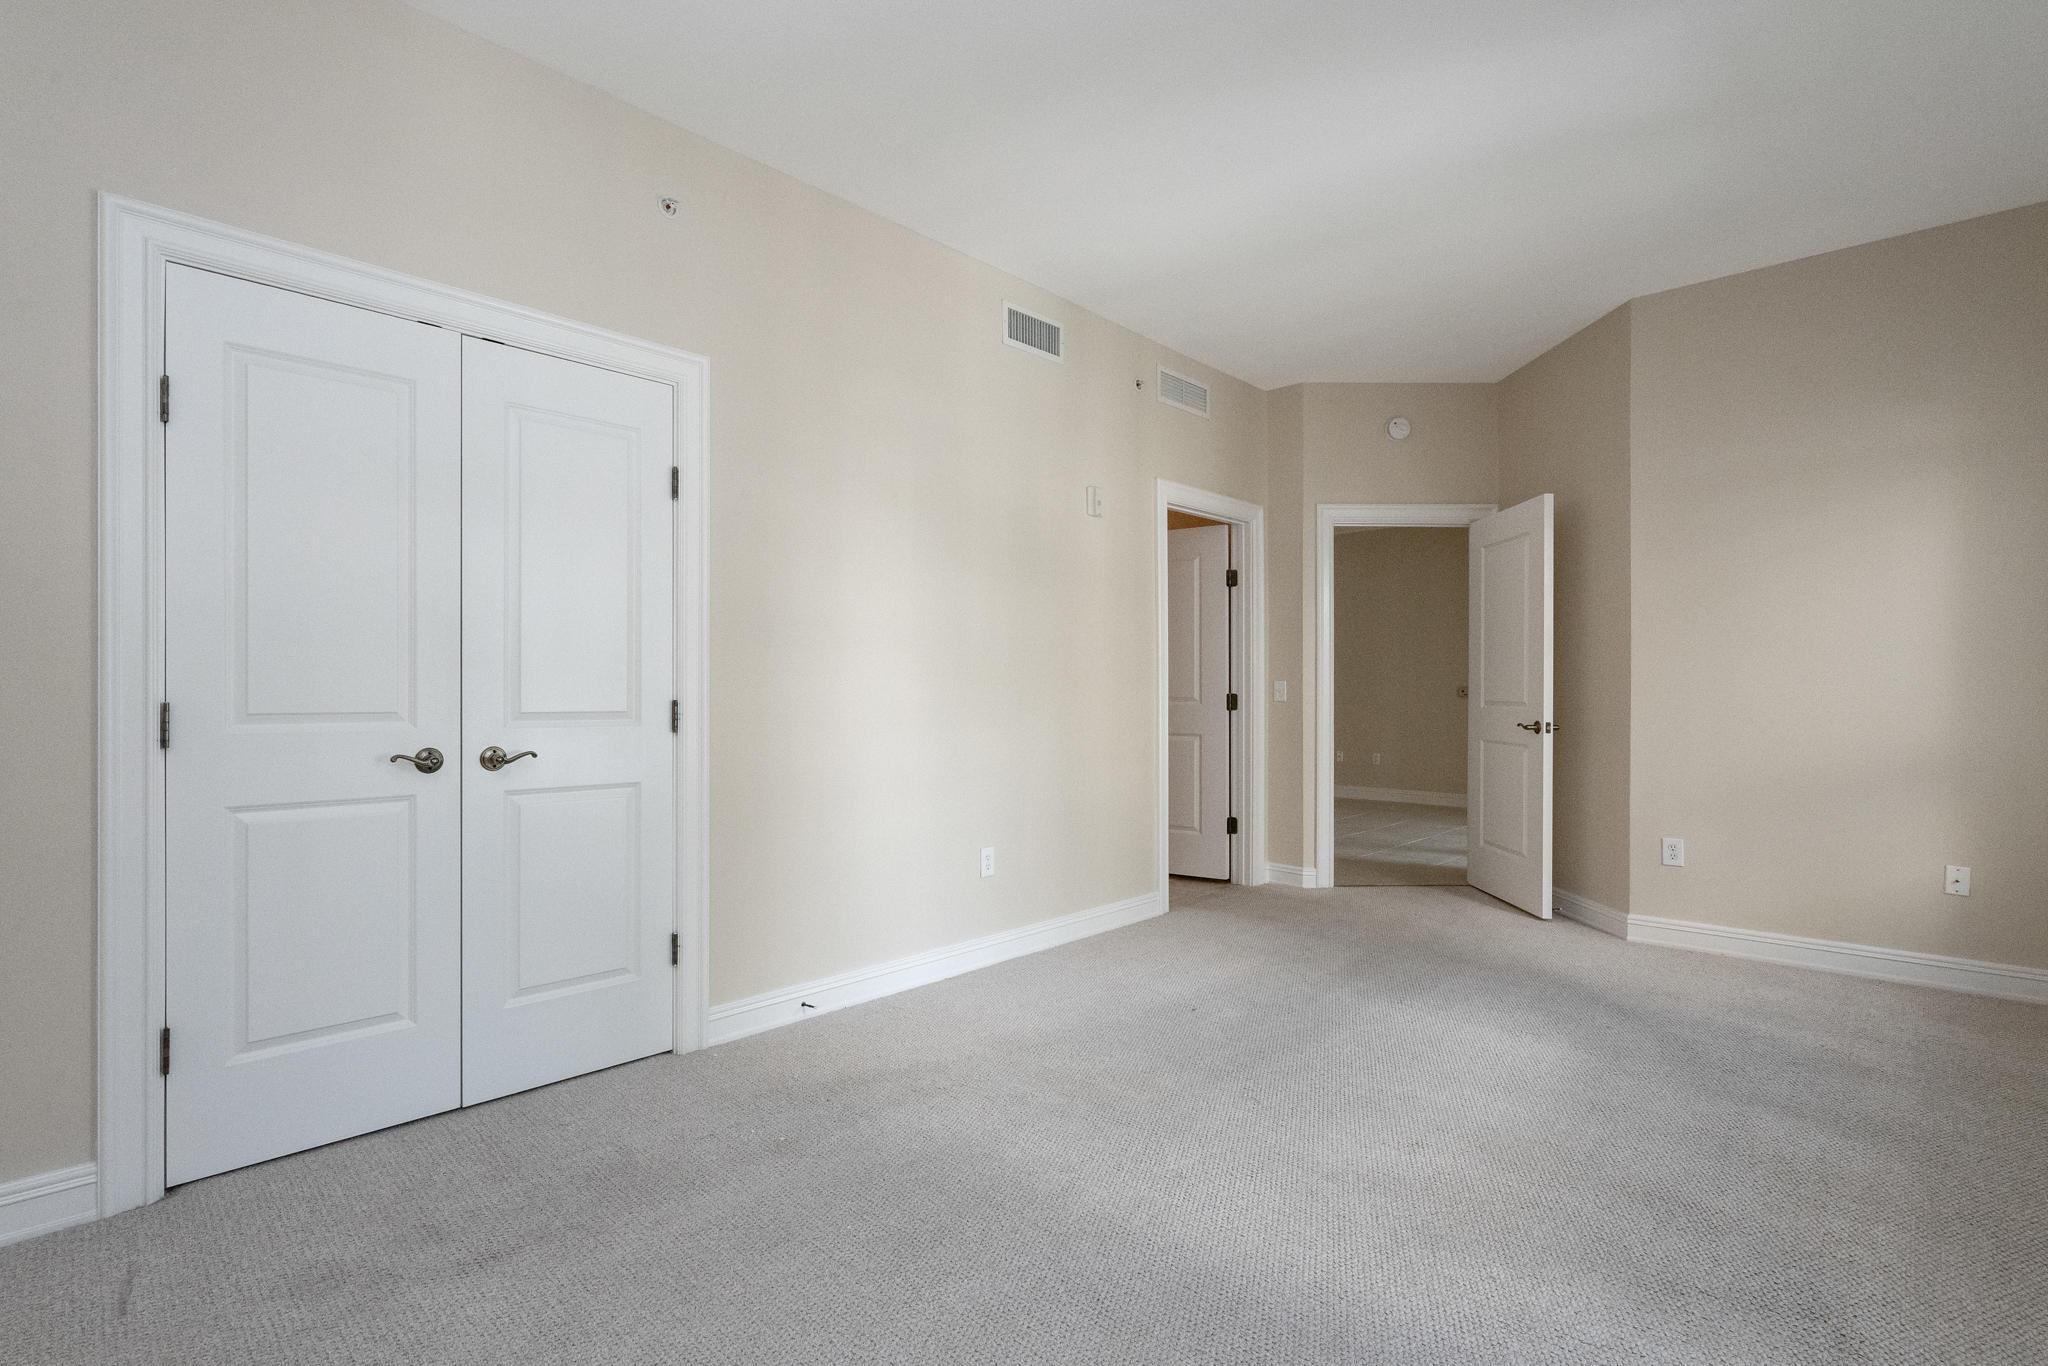 Image 12 For 16100 Emerald Estates Drive 390